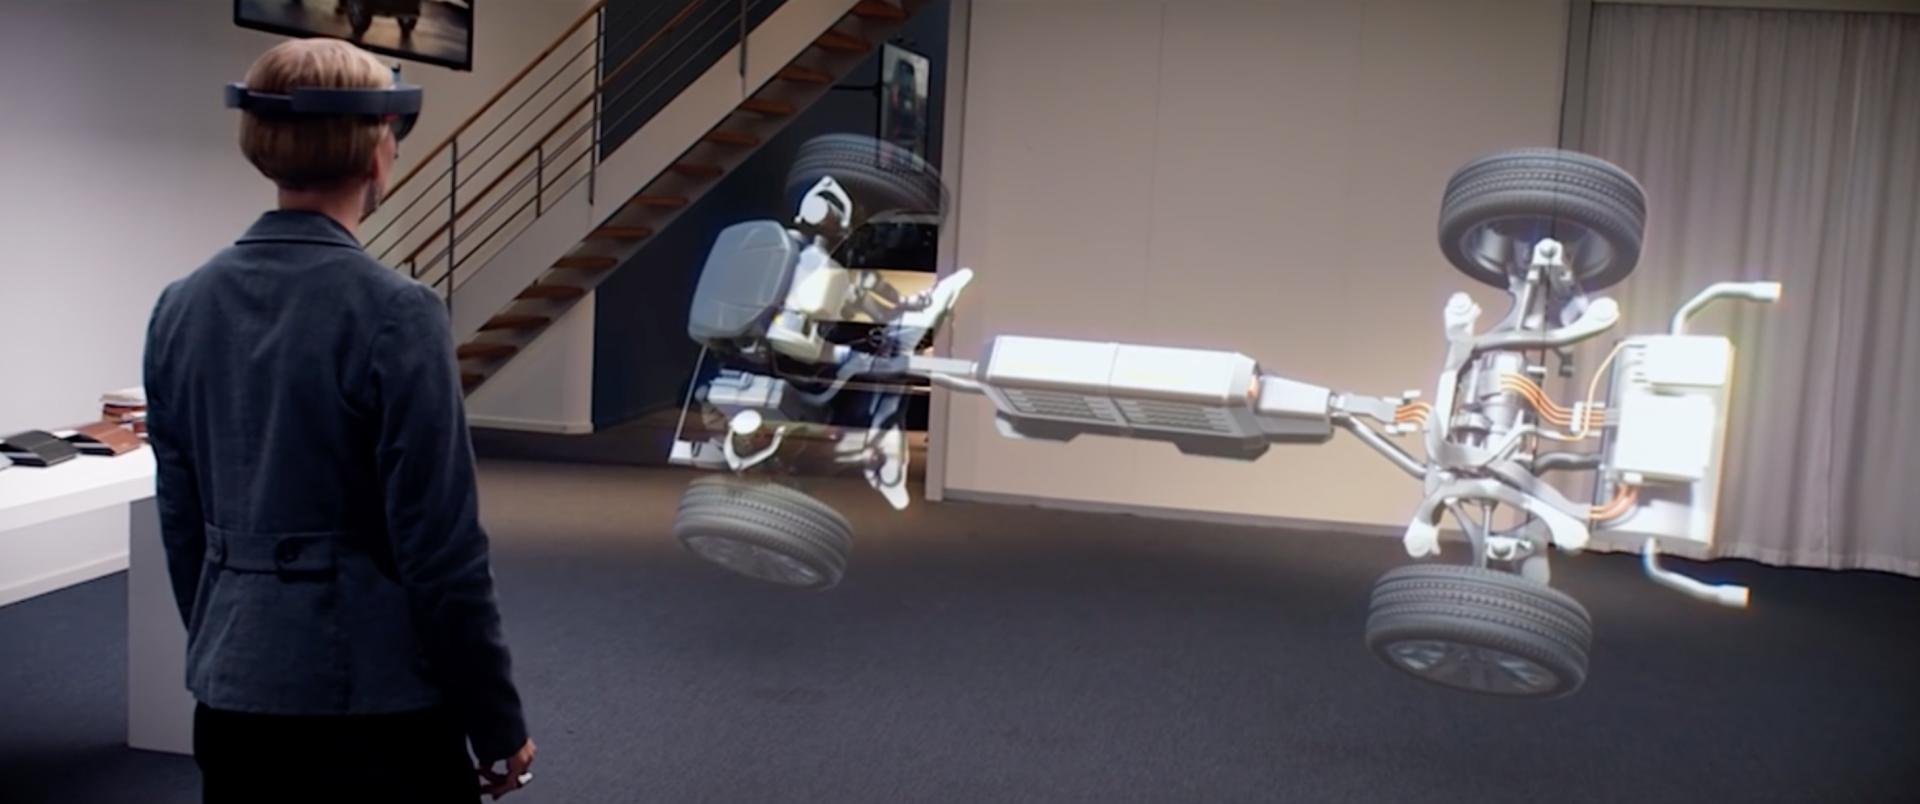 Volvo_HoloLens_9